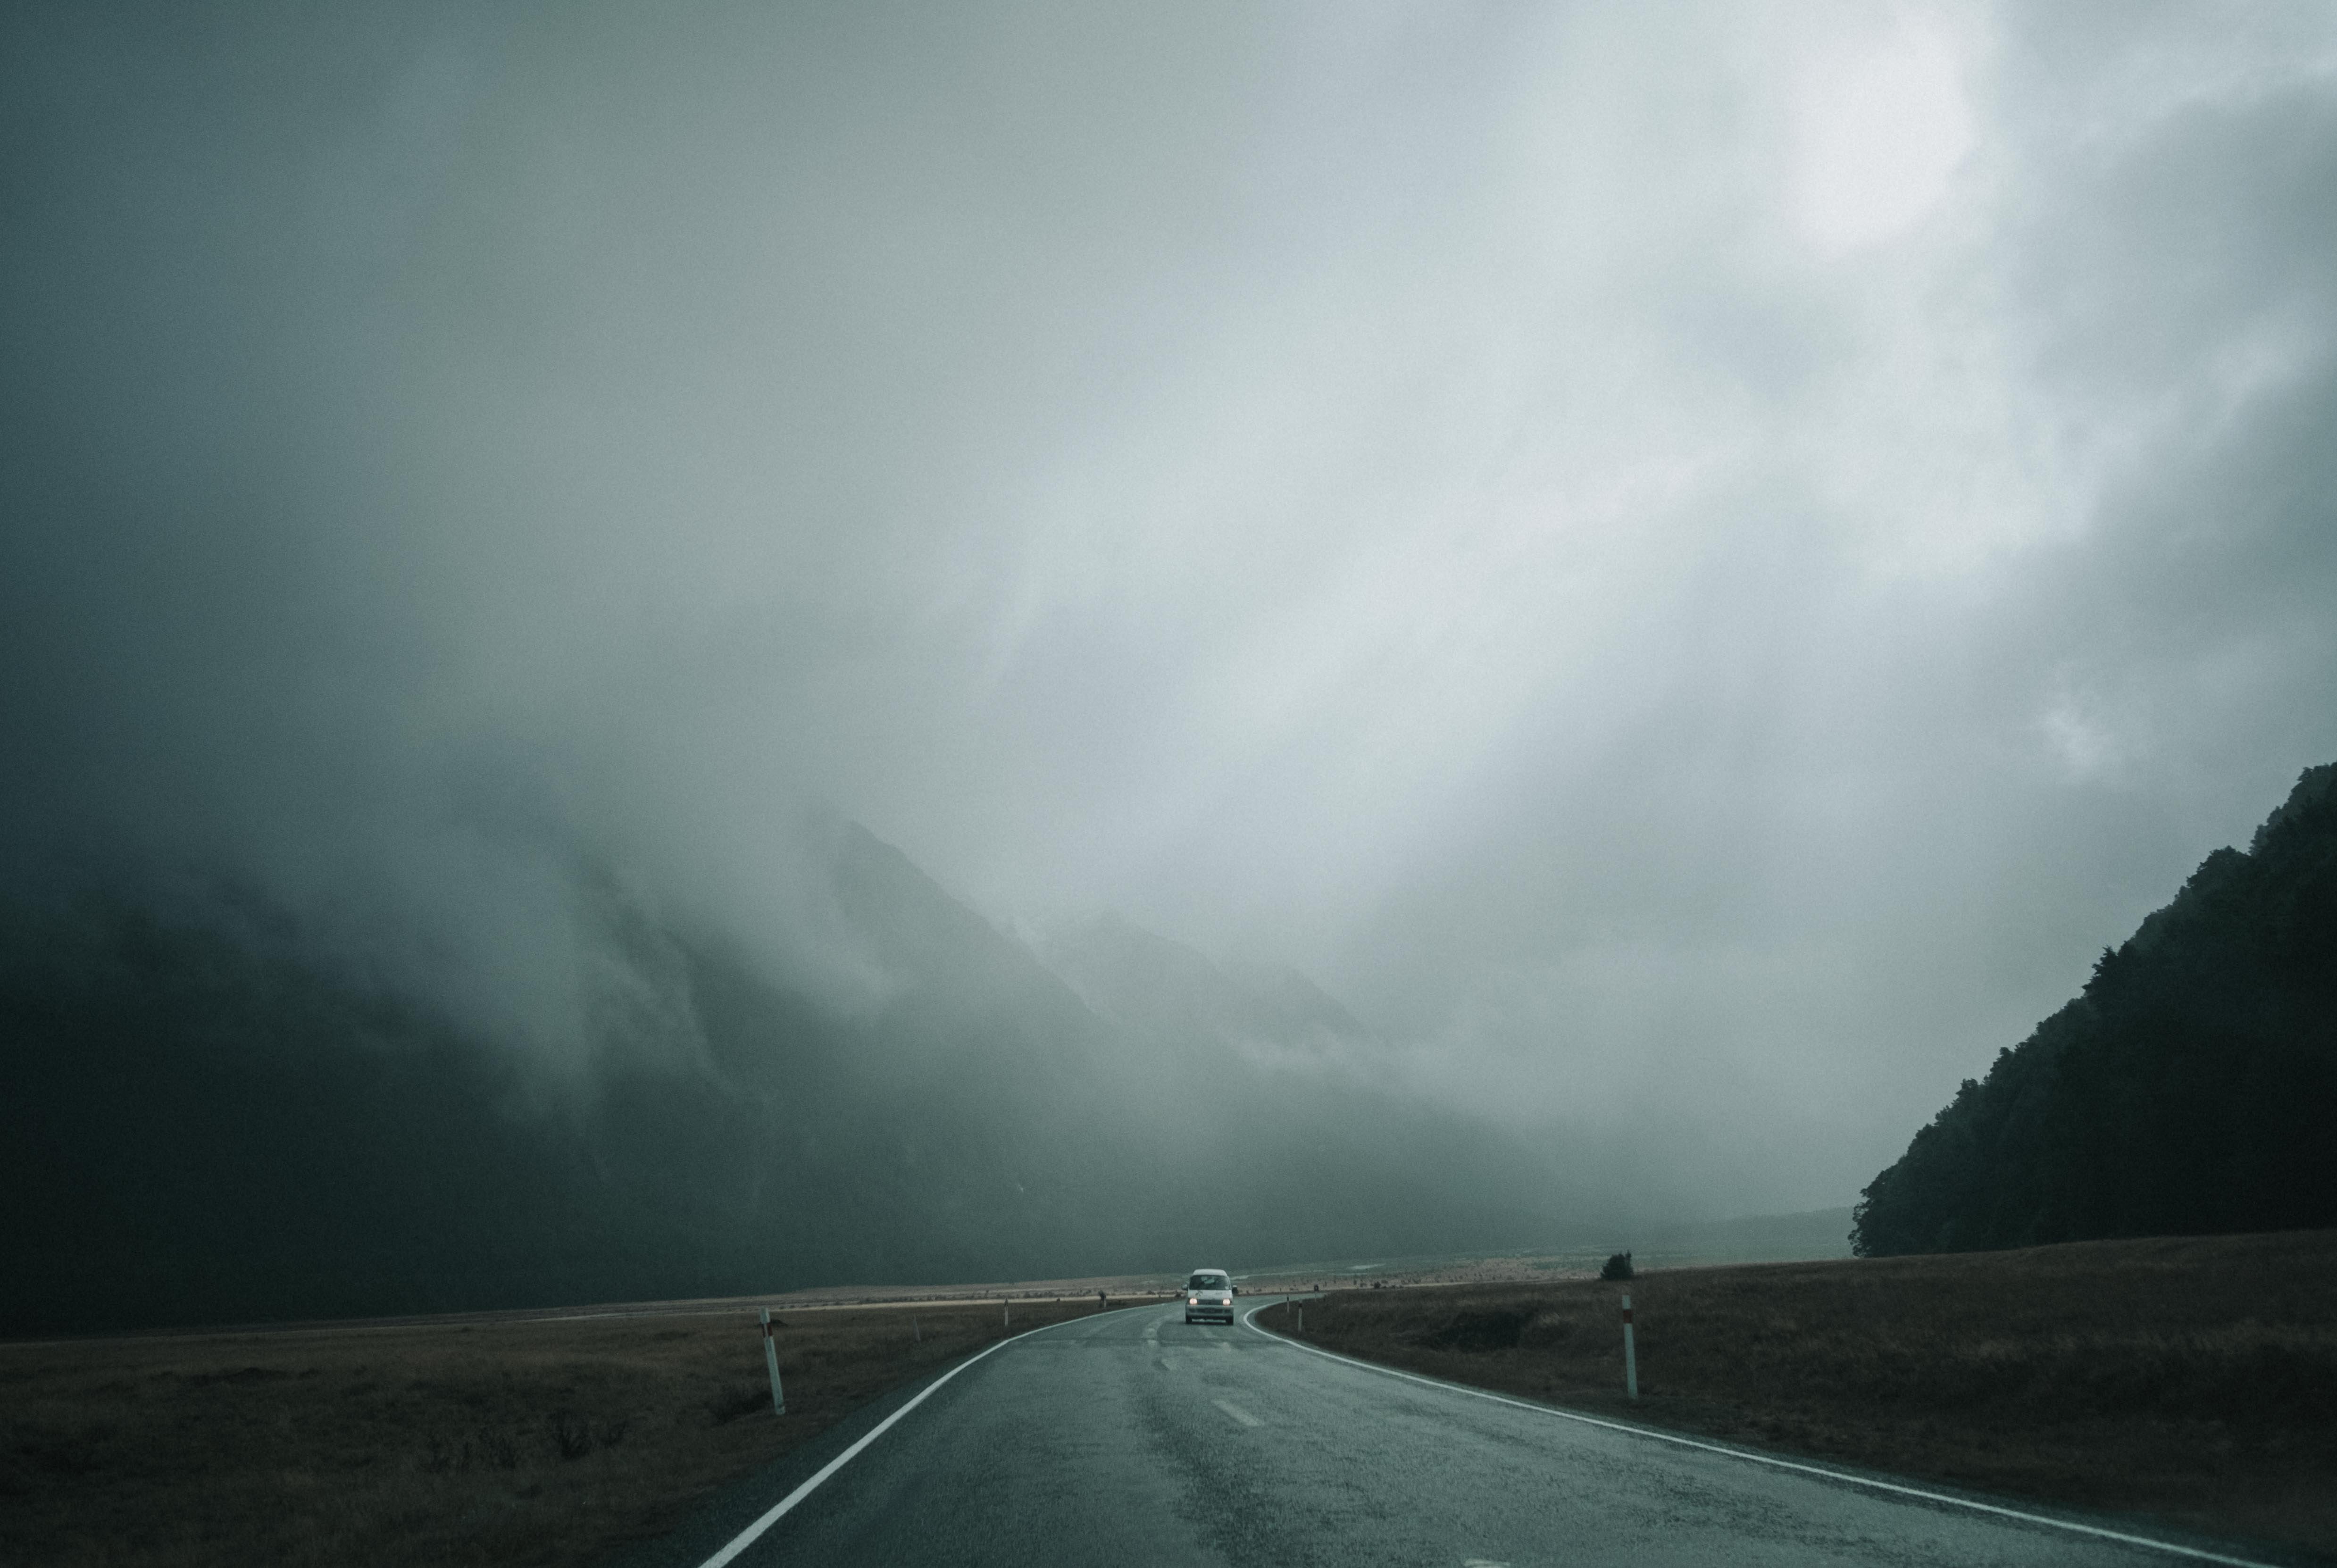 vehicle on asphalt road under gray cloudy sky